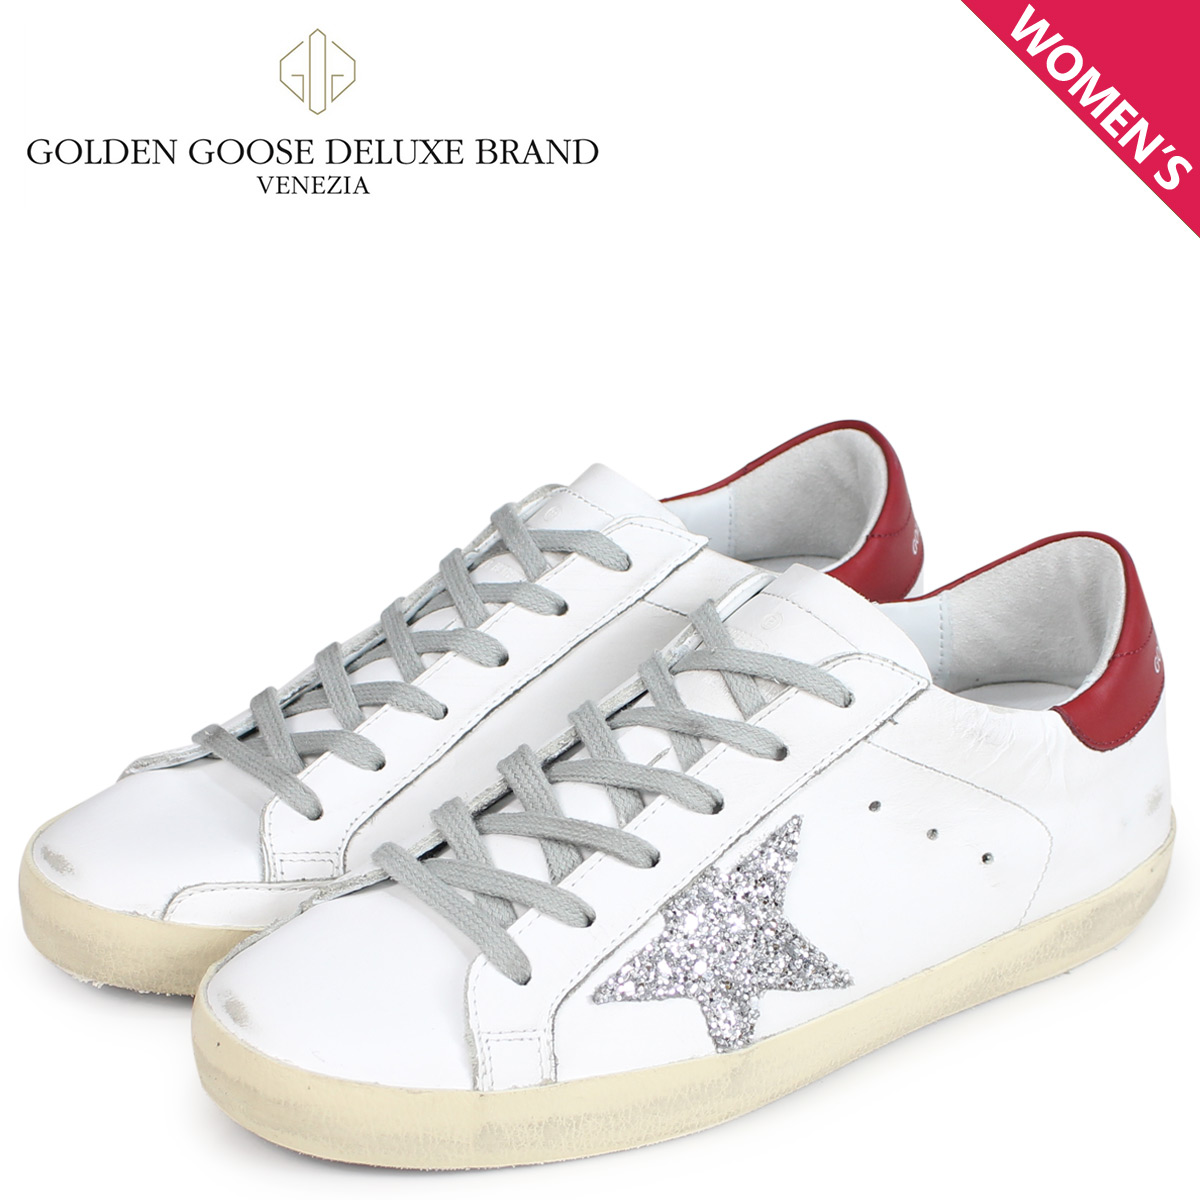 Golden Goose ゴールデングース スニーカー レディース スーパースター SNEAKERS SUPERSTAR ホワイト 白 G33WS590 H16